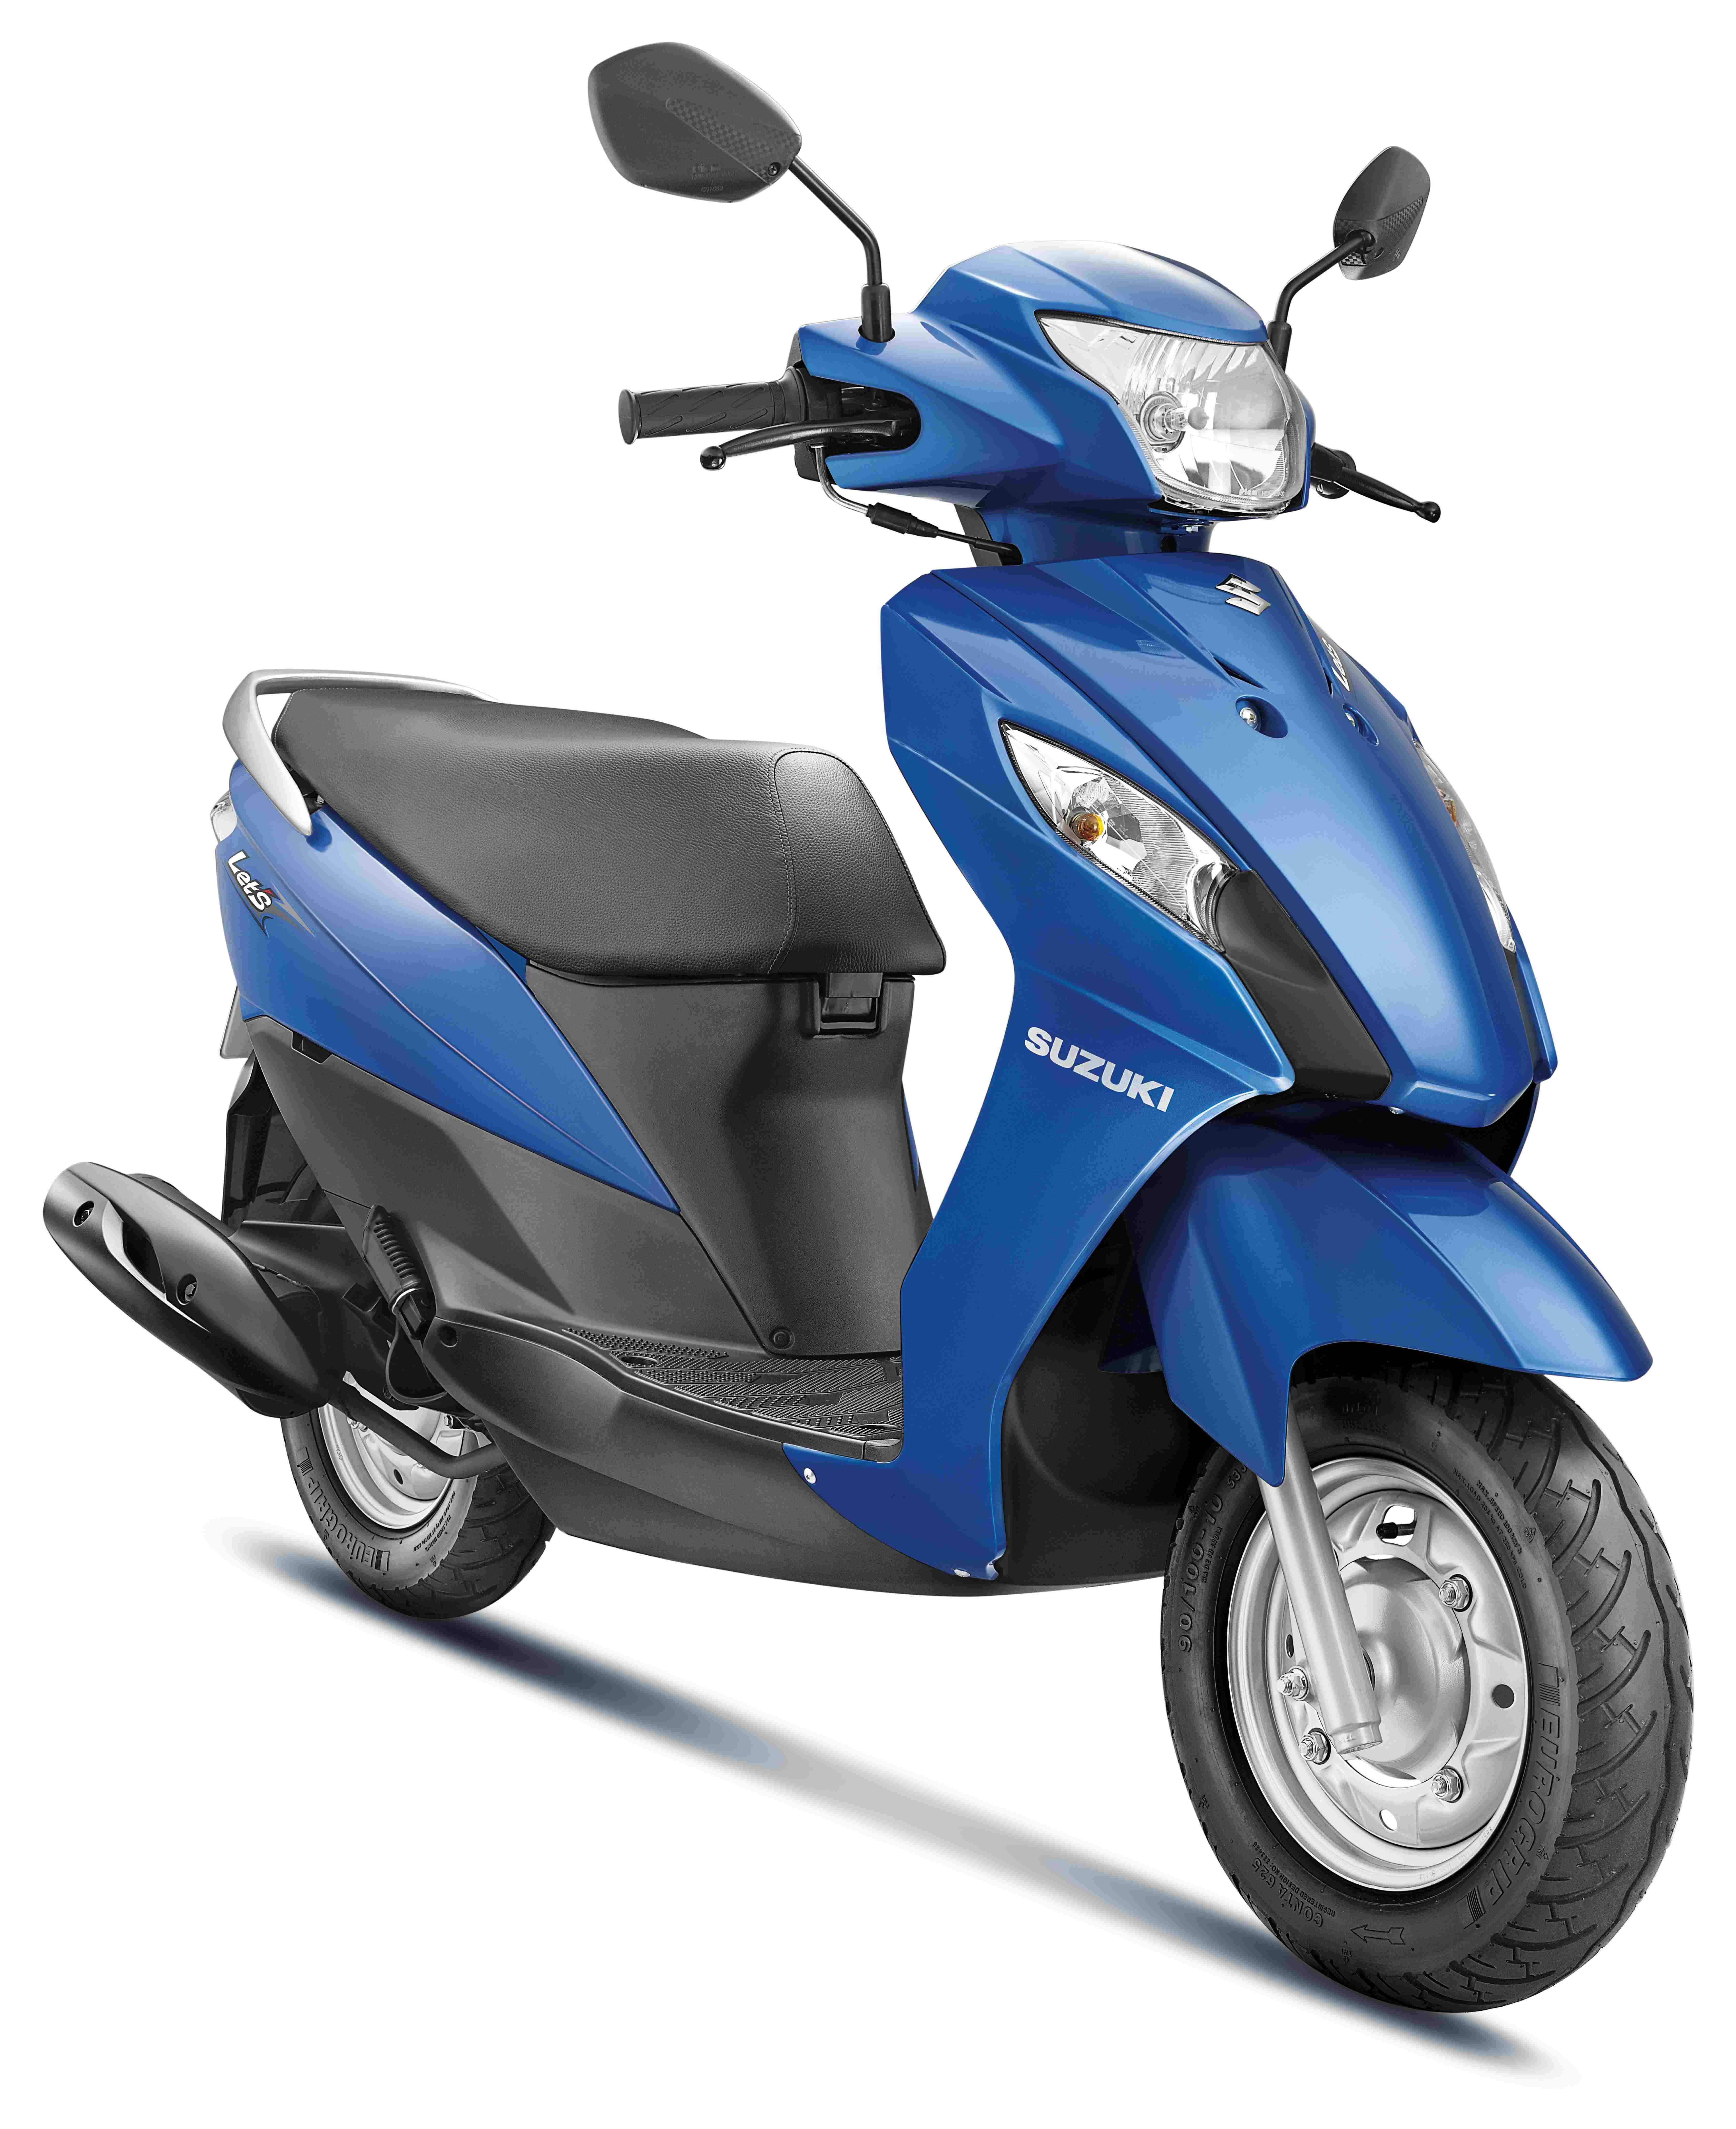 Suzuki Two Wheelers Unveils Two New Offerings The Gixxer